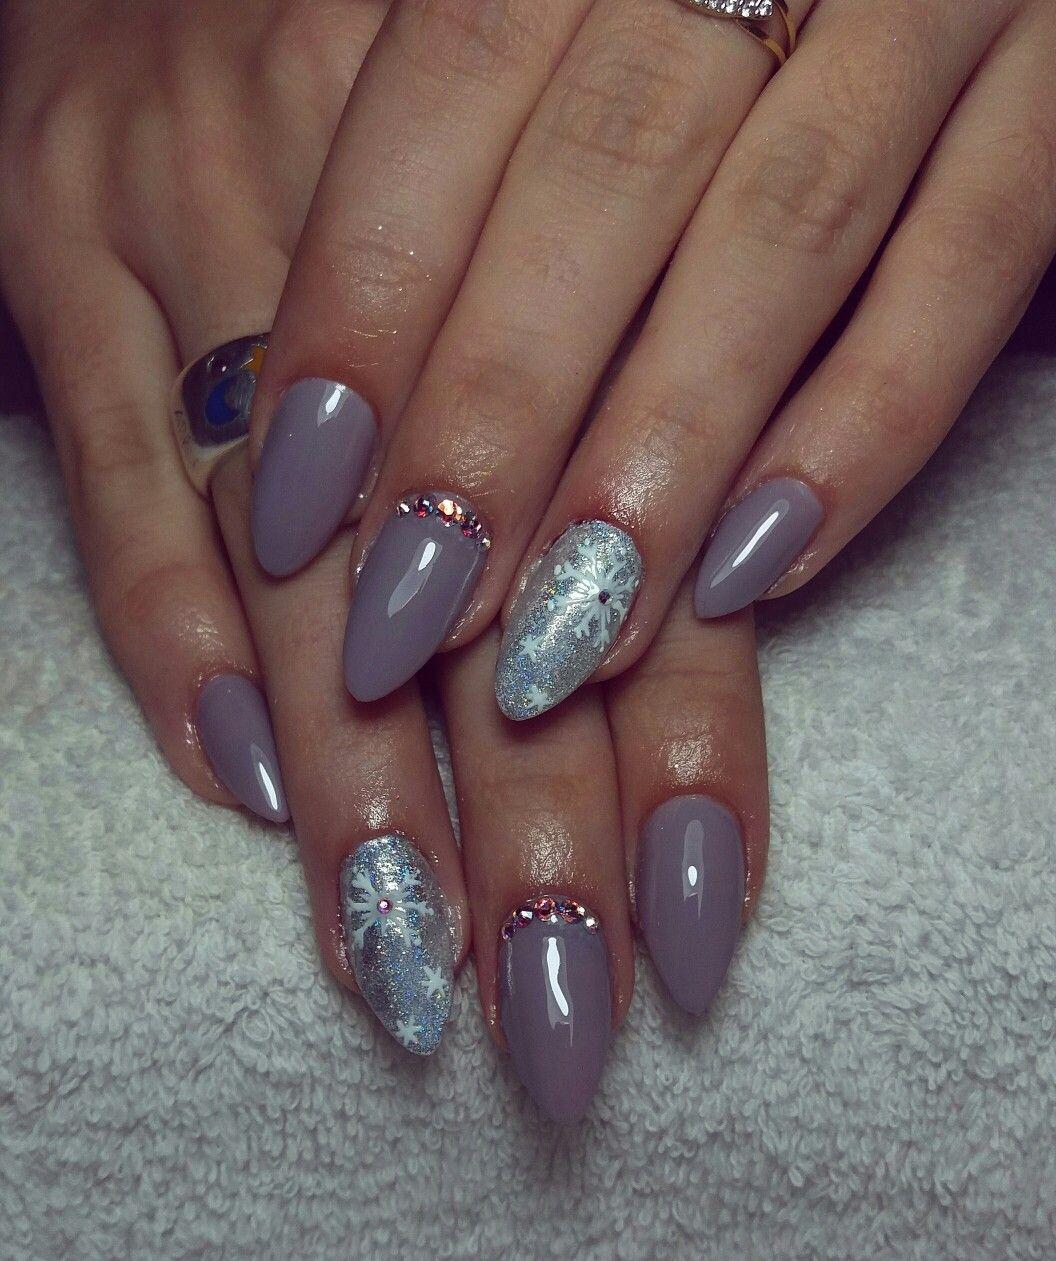 Pin by Truta Roxana on Craciun- nails | Pinterest | Nails games ...